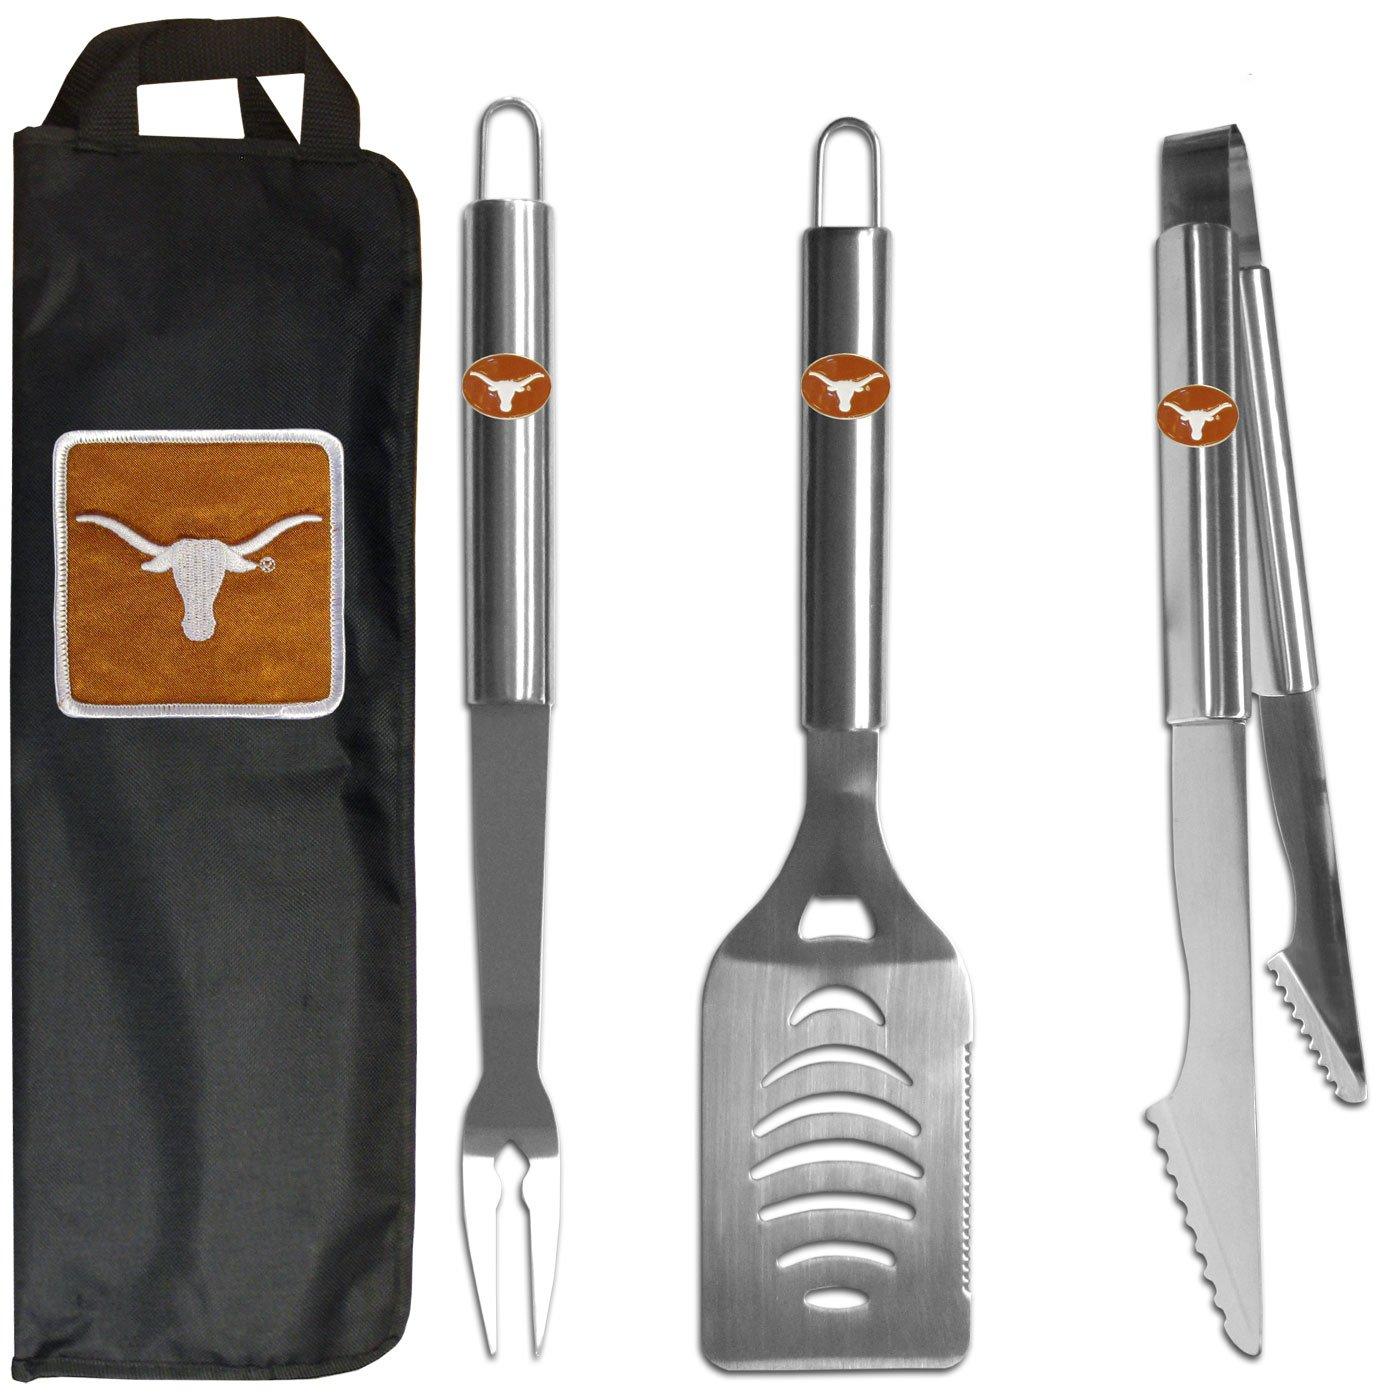 Siskiyou NCAA Texas Longhorns Stainless Steel BBQ Set with Bag (3 Piece), Black